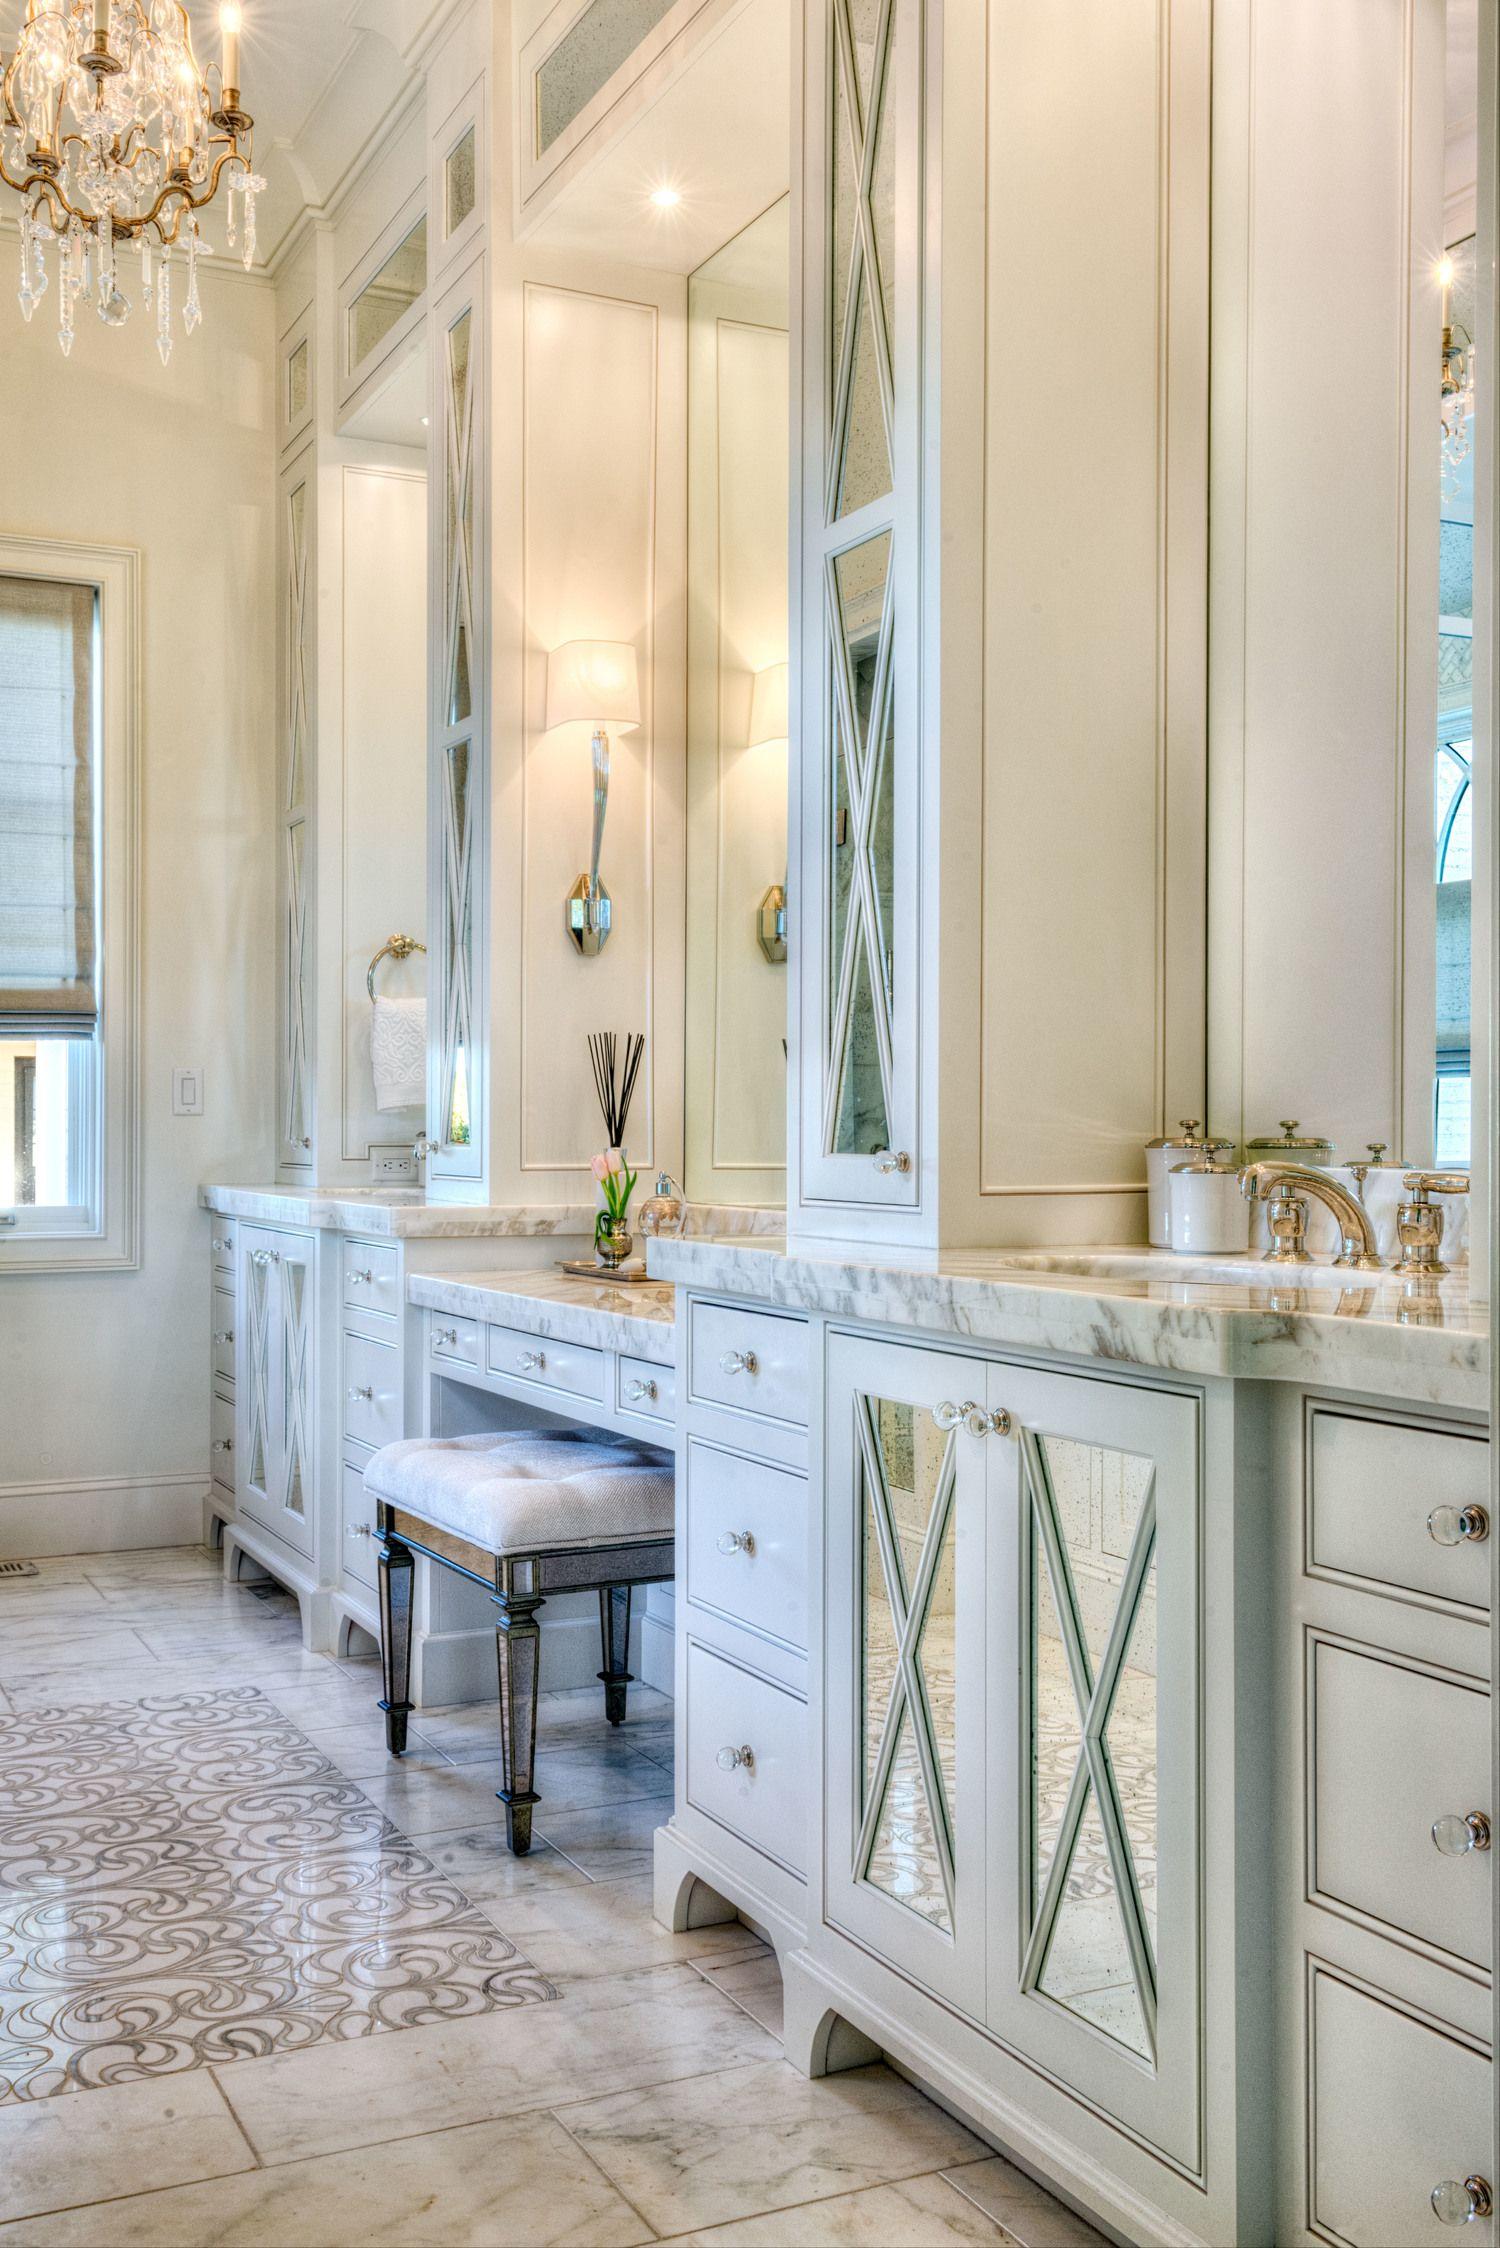 50 Trending Bathroom That Always Look Fantastic Home Decoration Experts